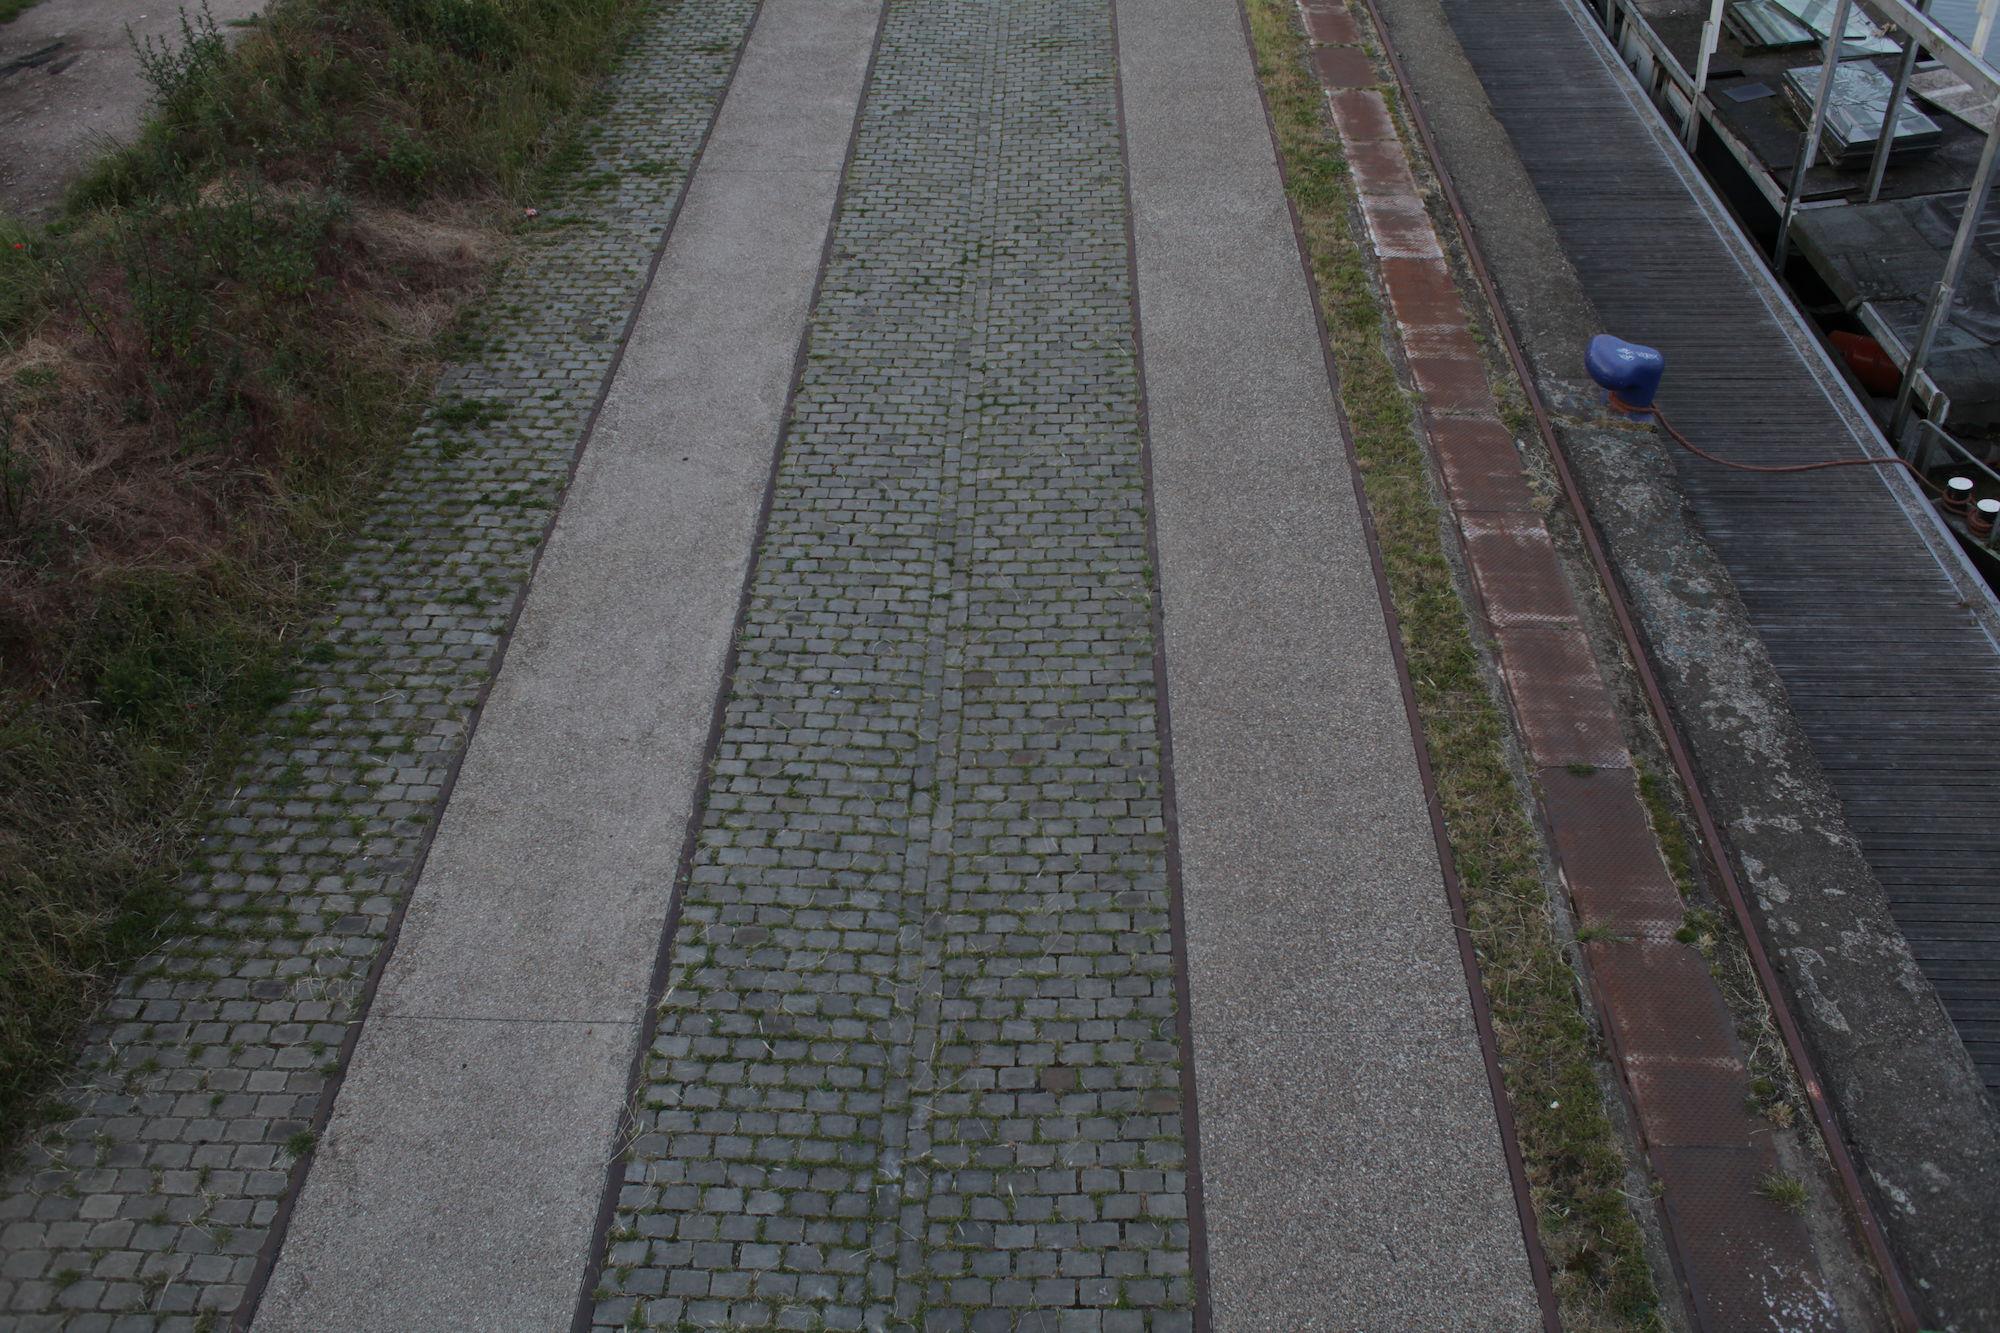 015 Oude Dokken 2019_051_IMG_9987.JPG